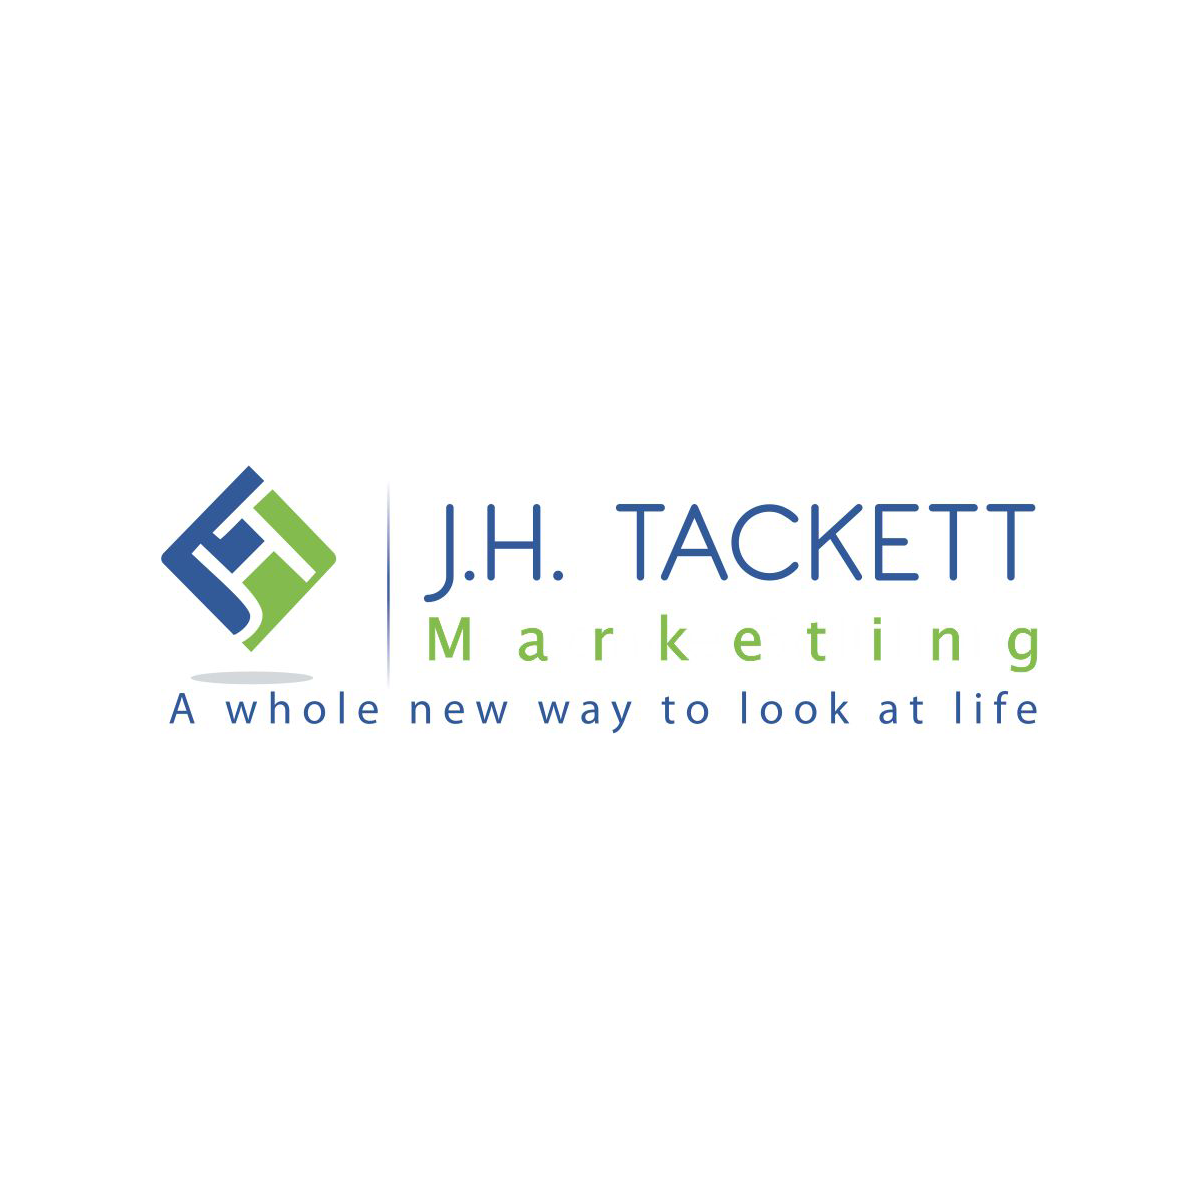 J. H. Tackett Marketing